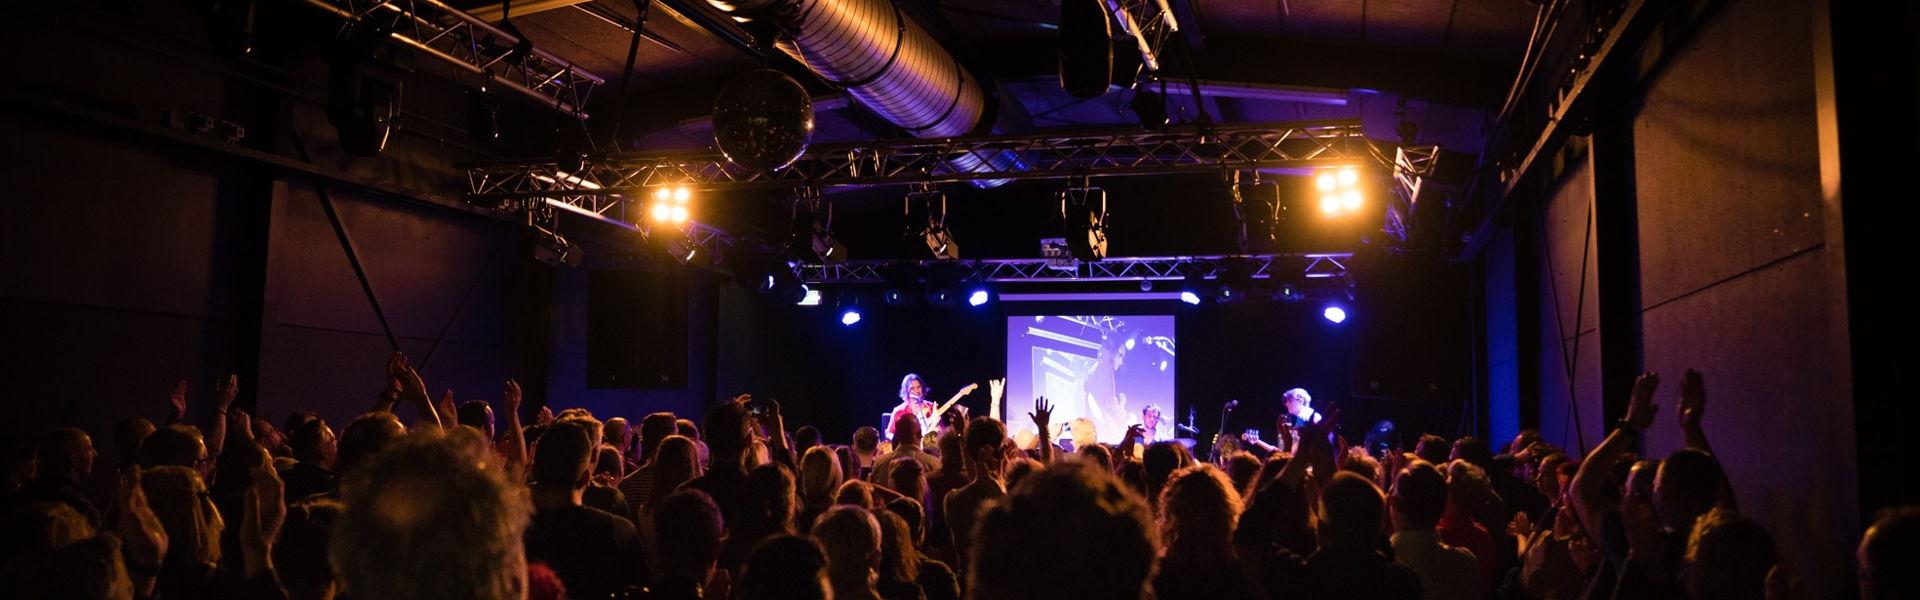 Jett Rebel in december 2019 in Het Podium.